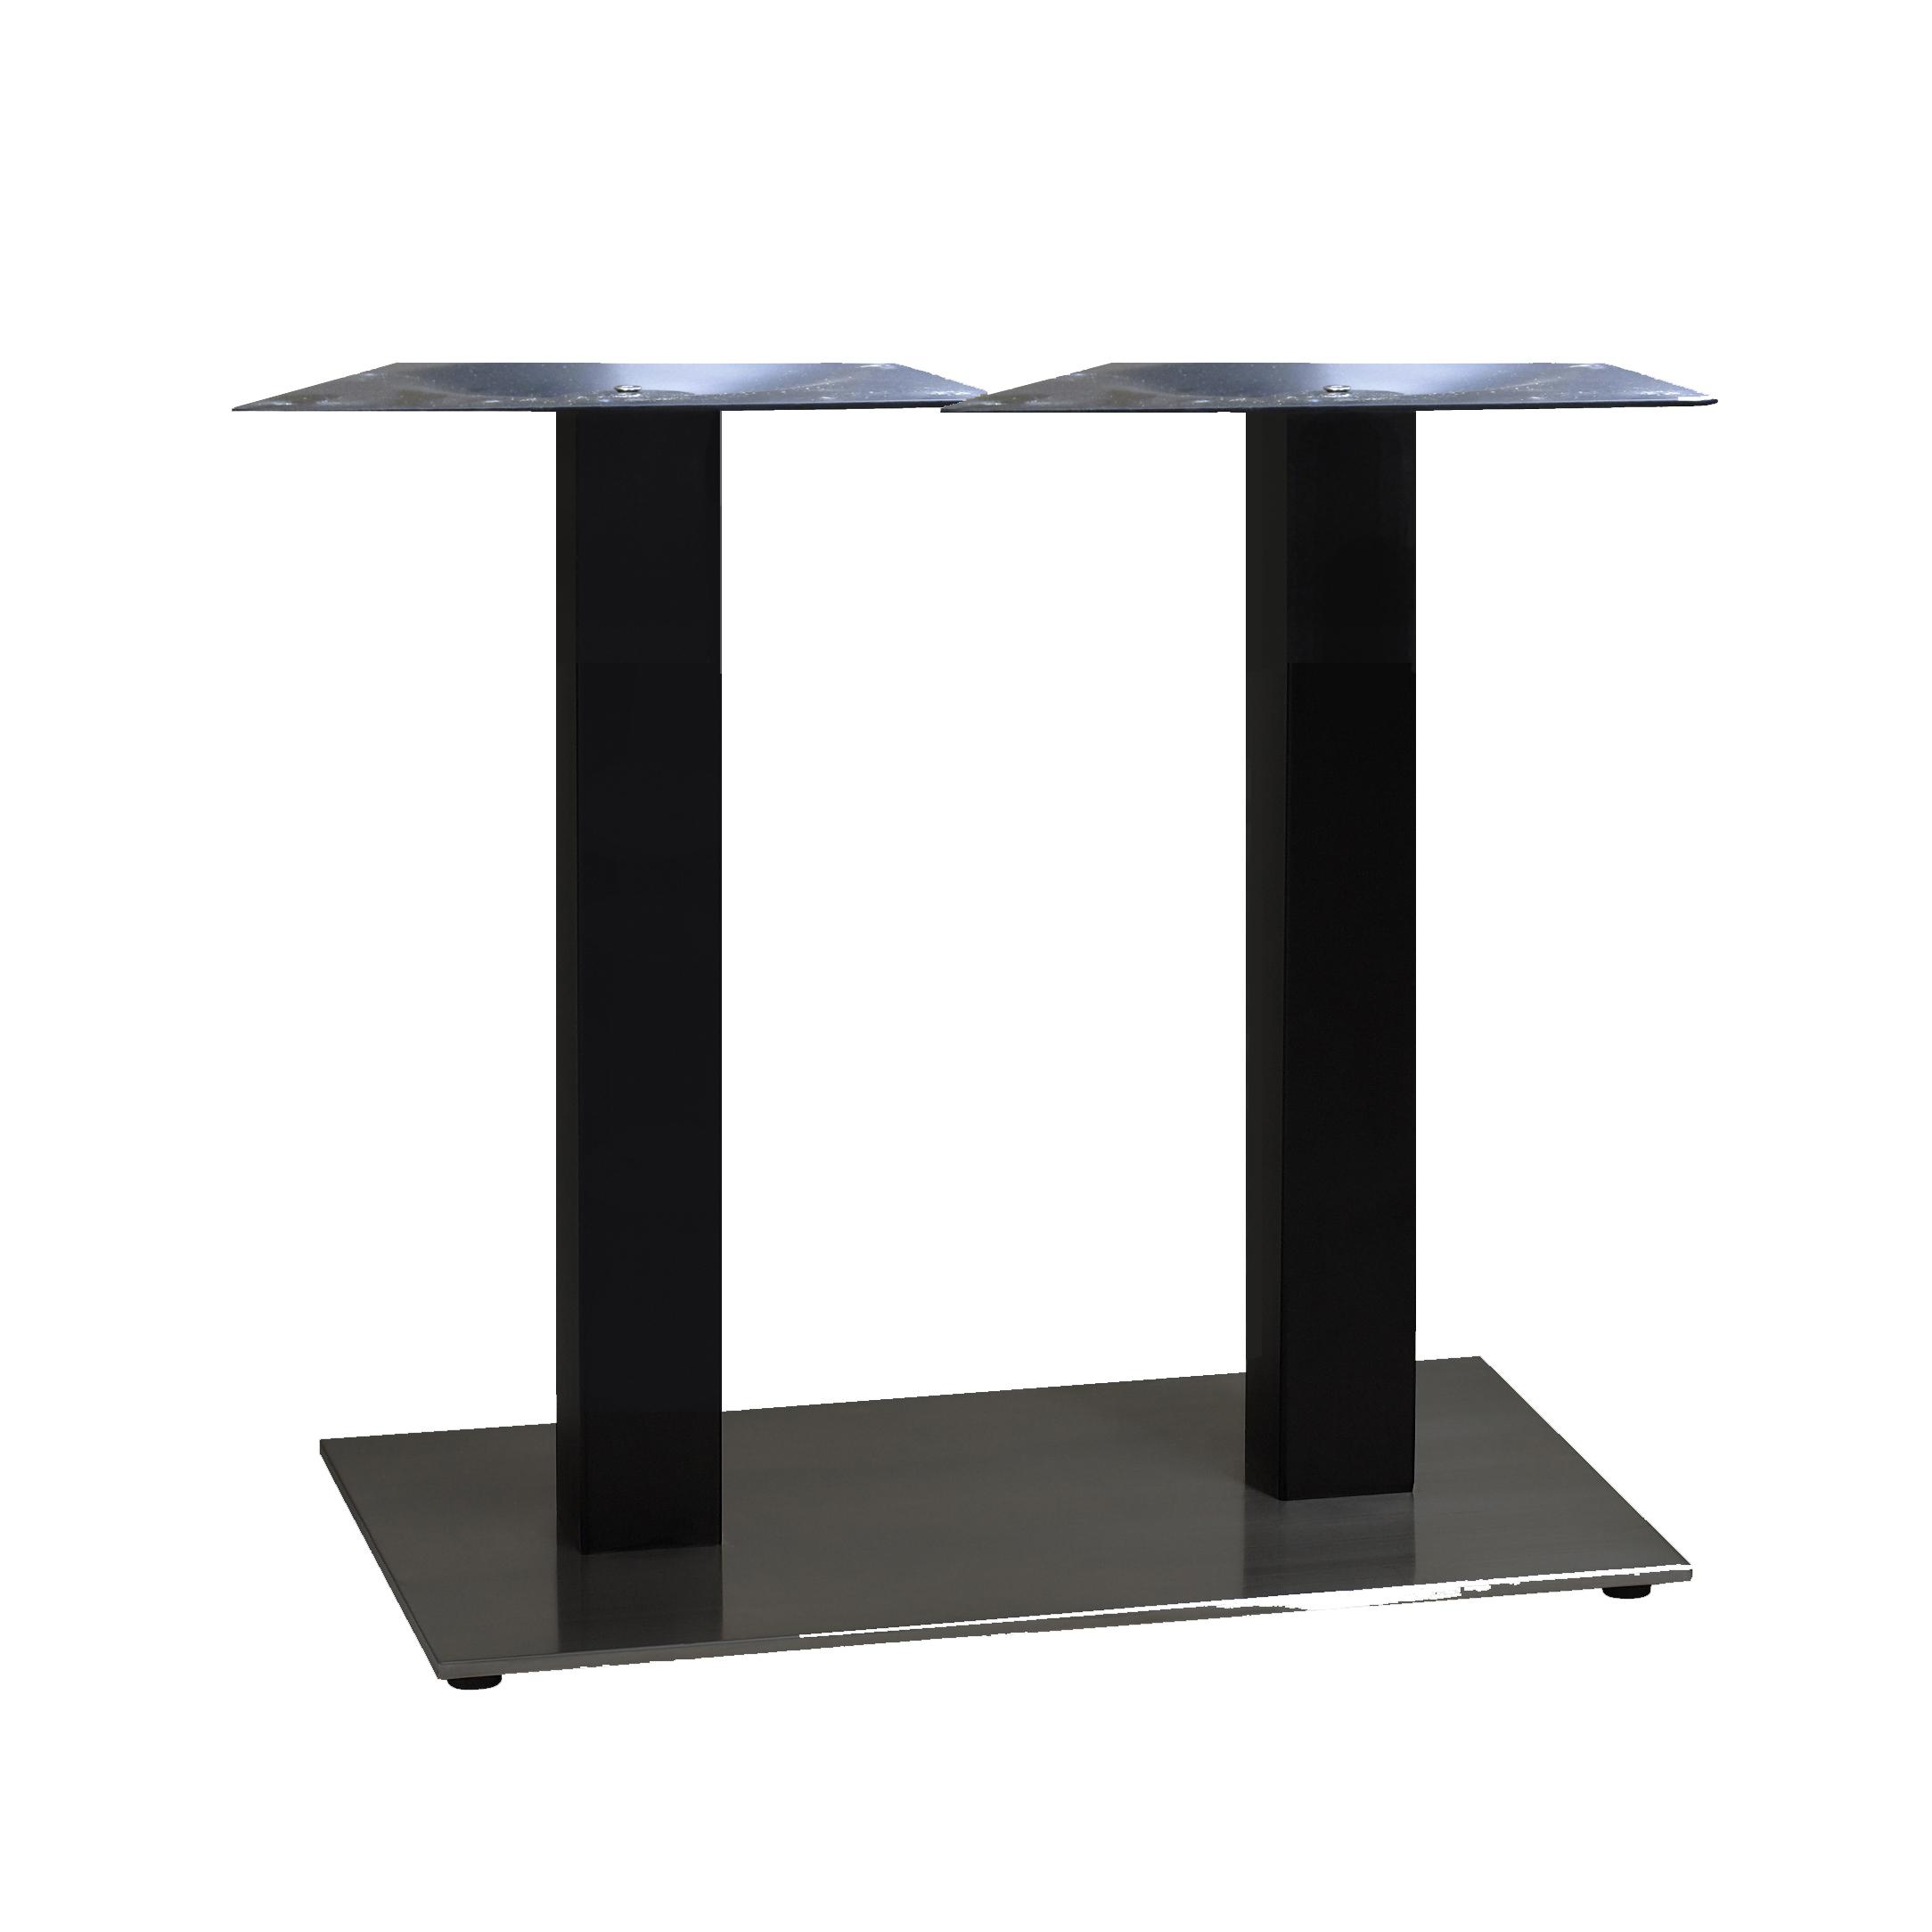 Grosfillex US291217 table base, metal